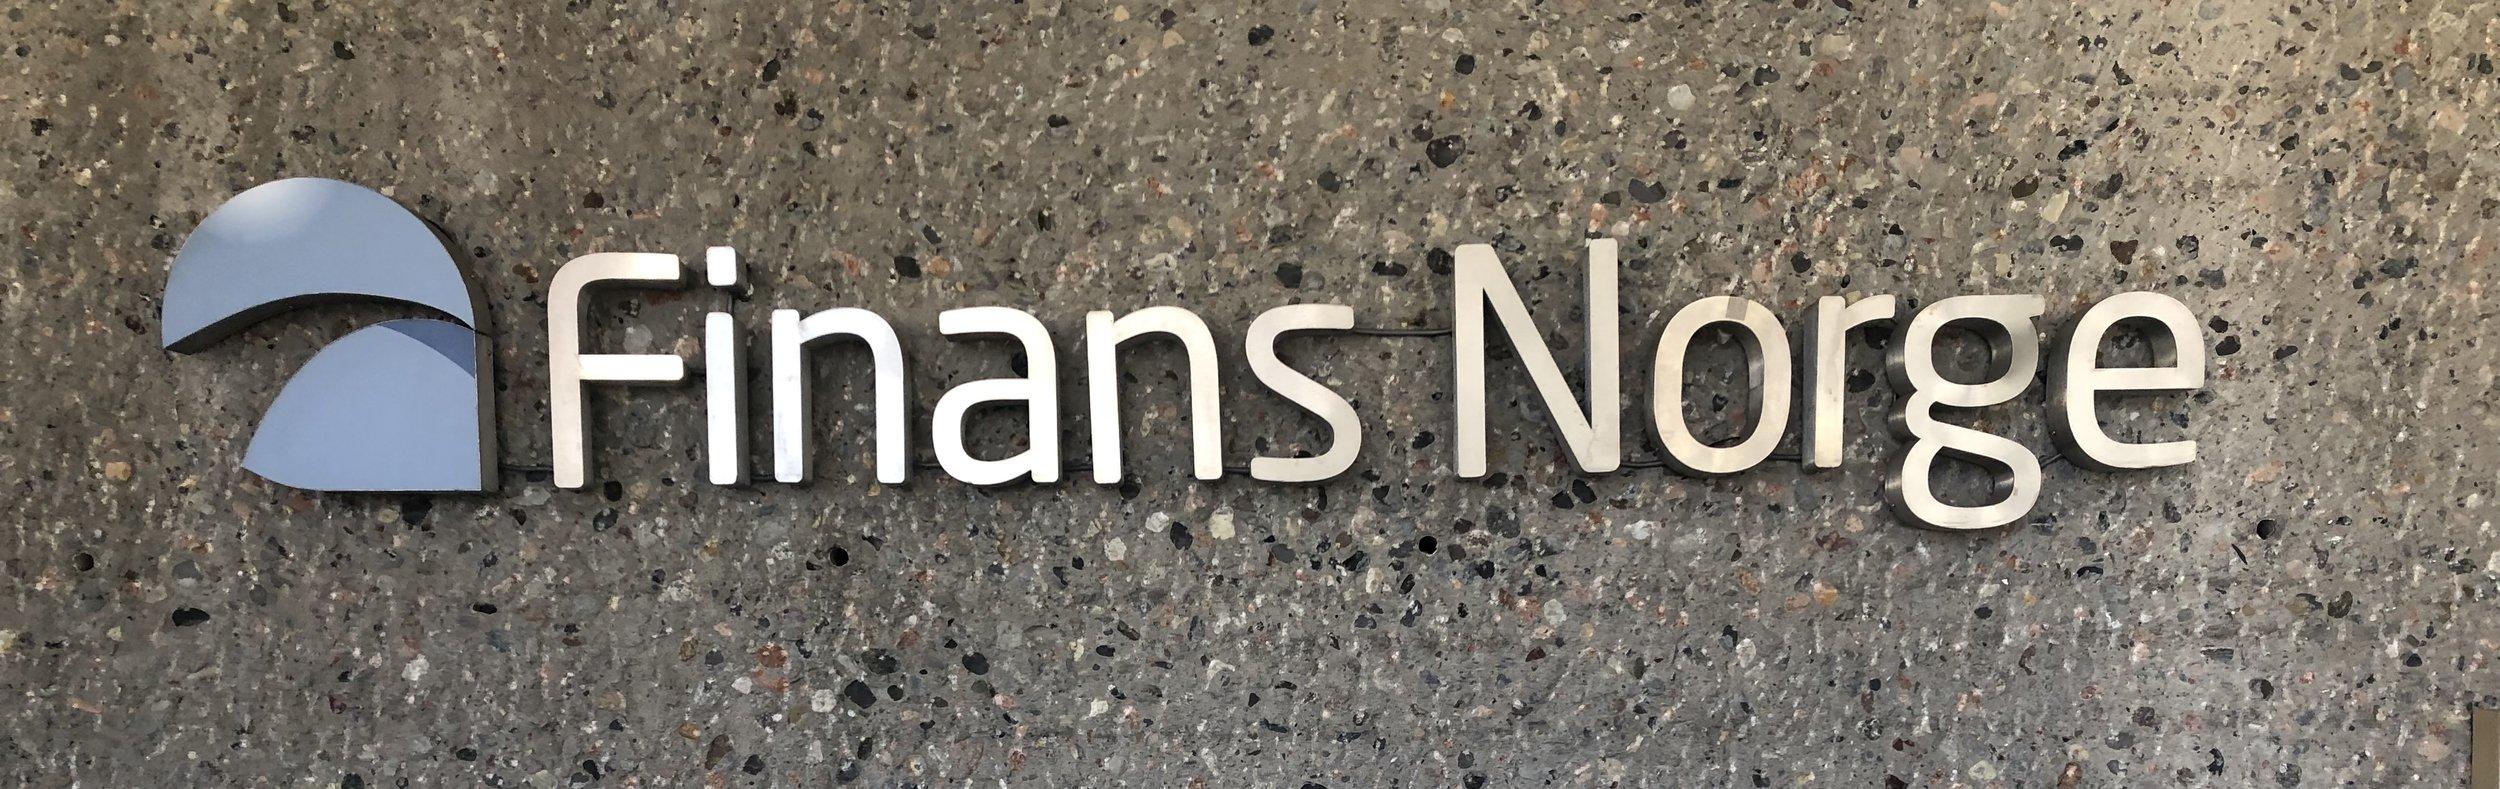 Finans Norge-logoen på veggen i inngangspartiet.